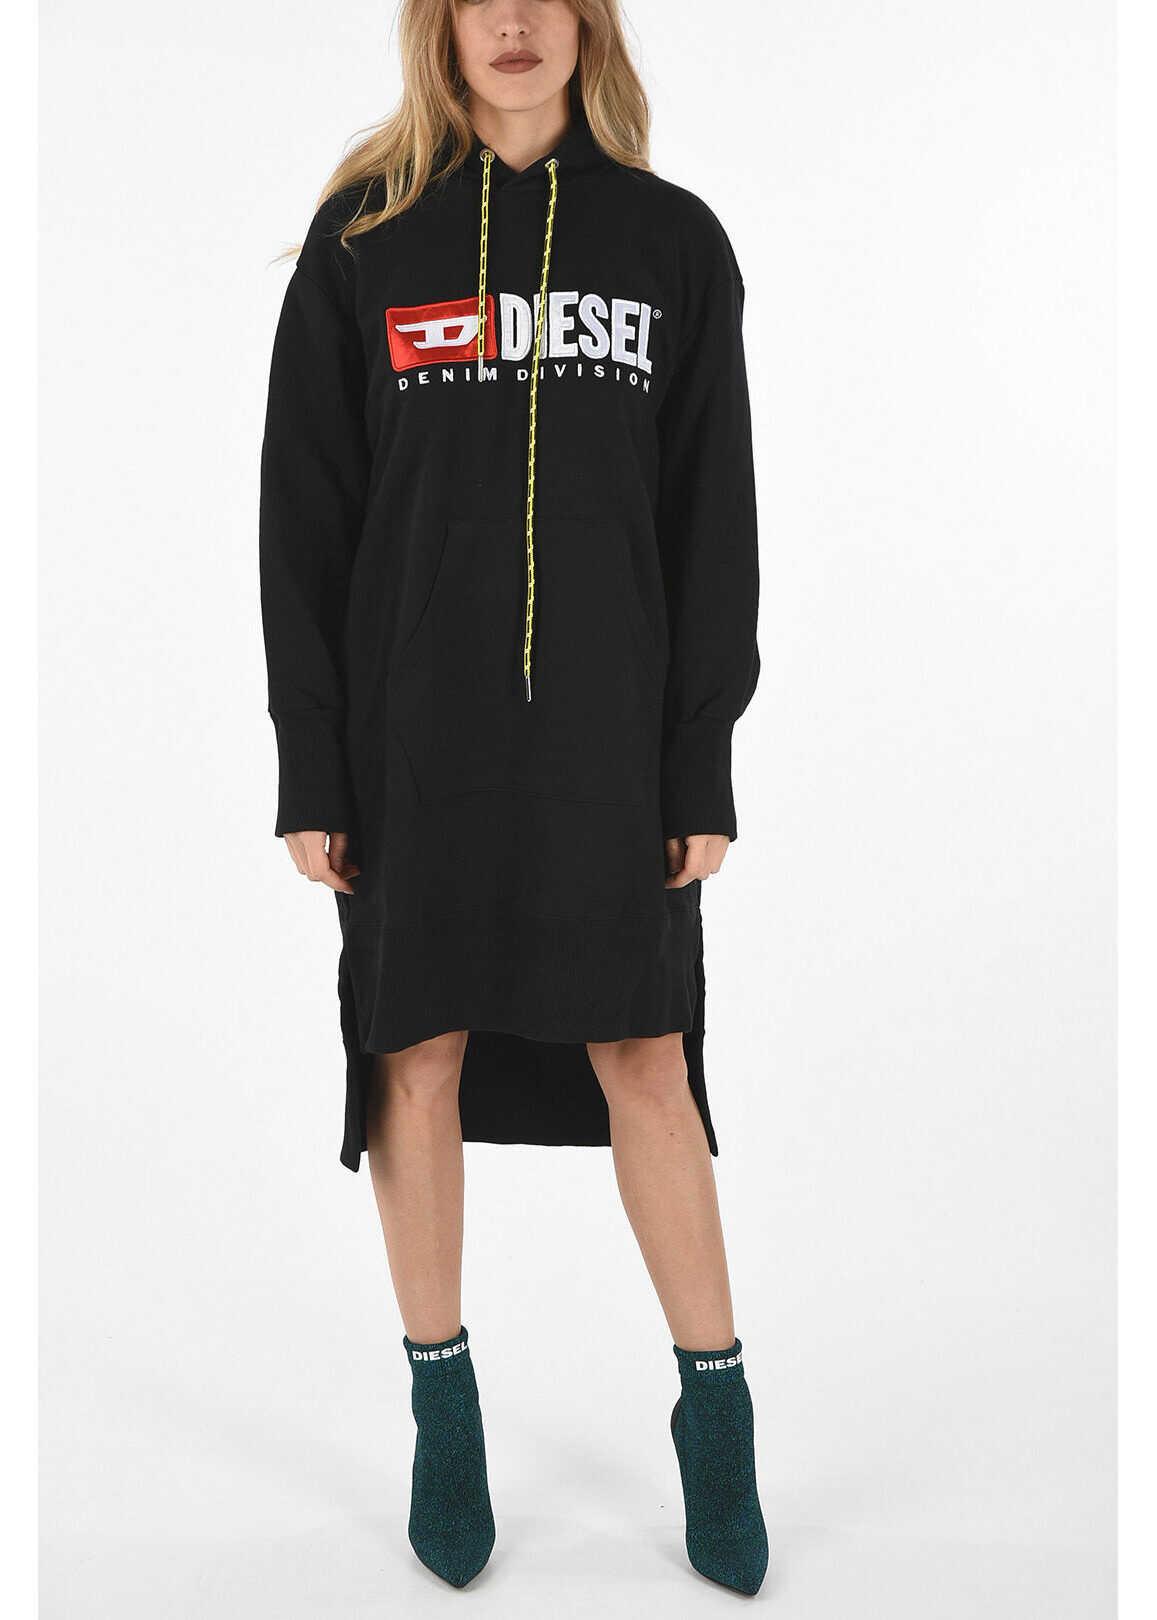 Diesel Hooded D-ILSE-C Asymmetrical Cut Dress* BLACK